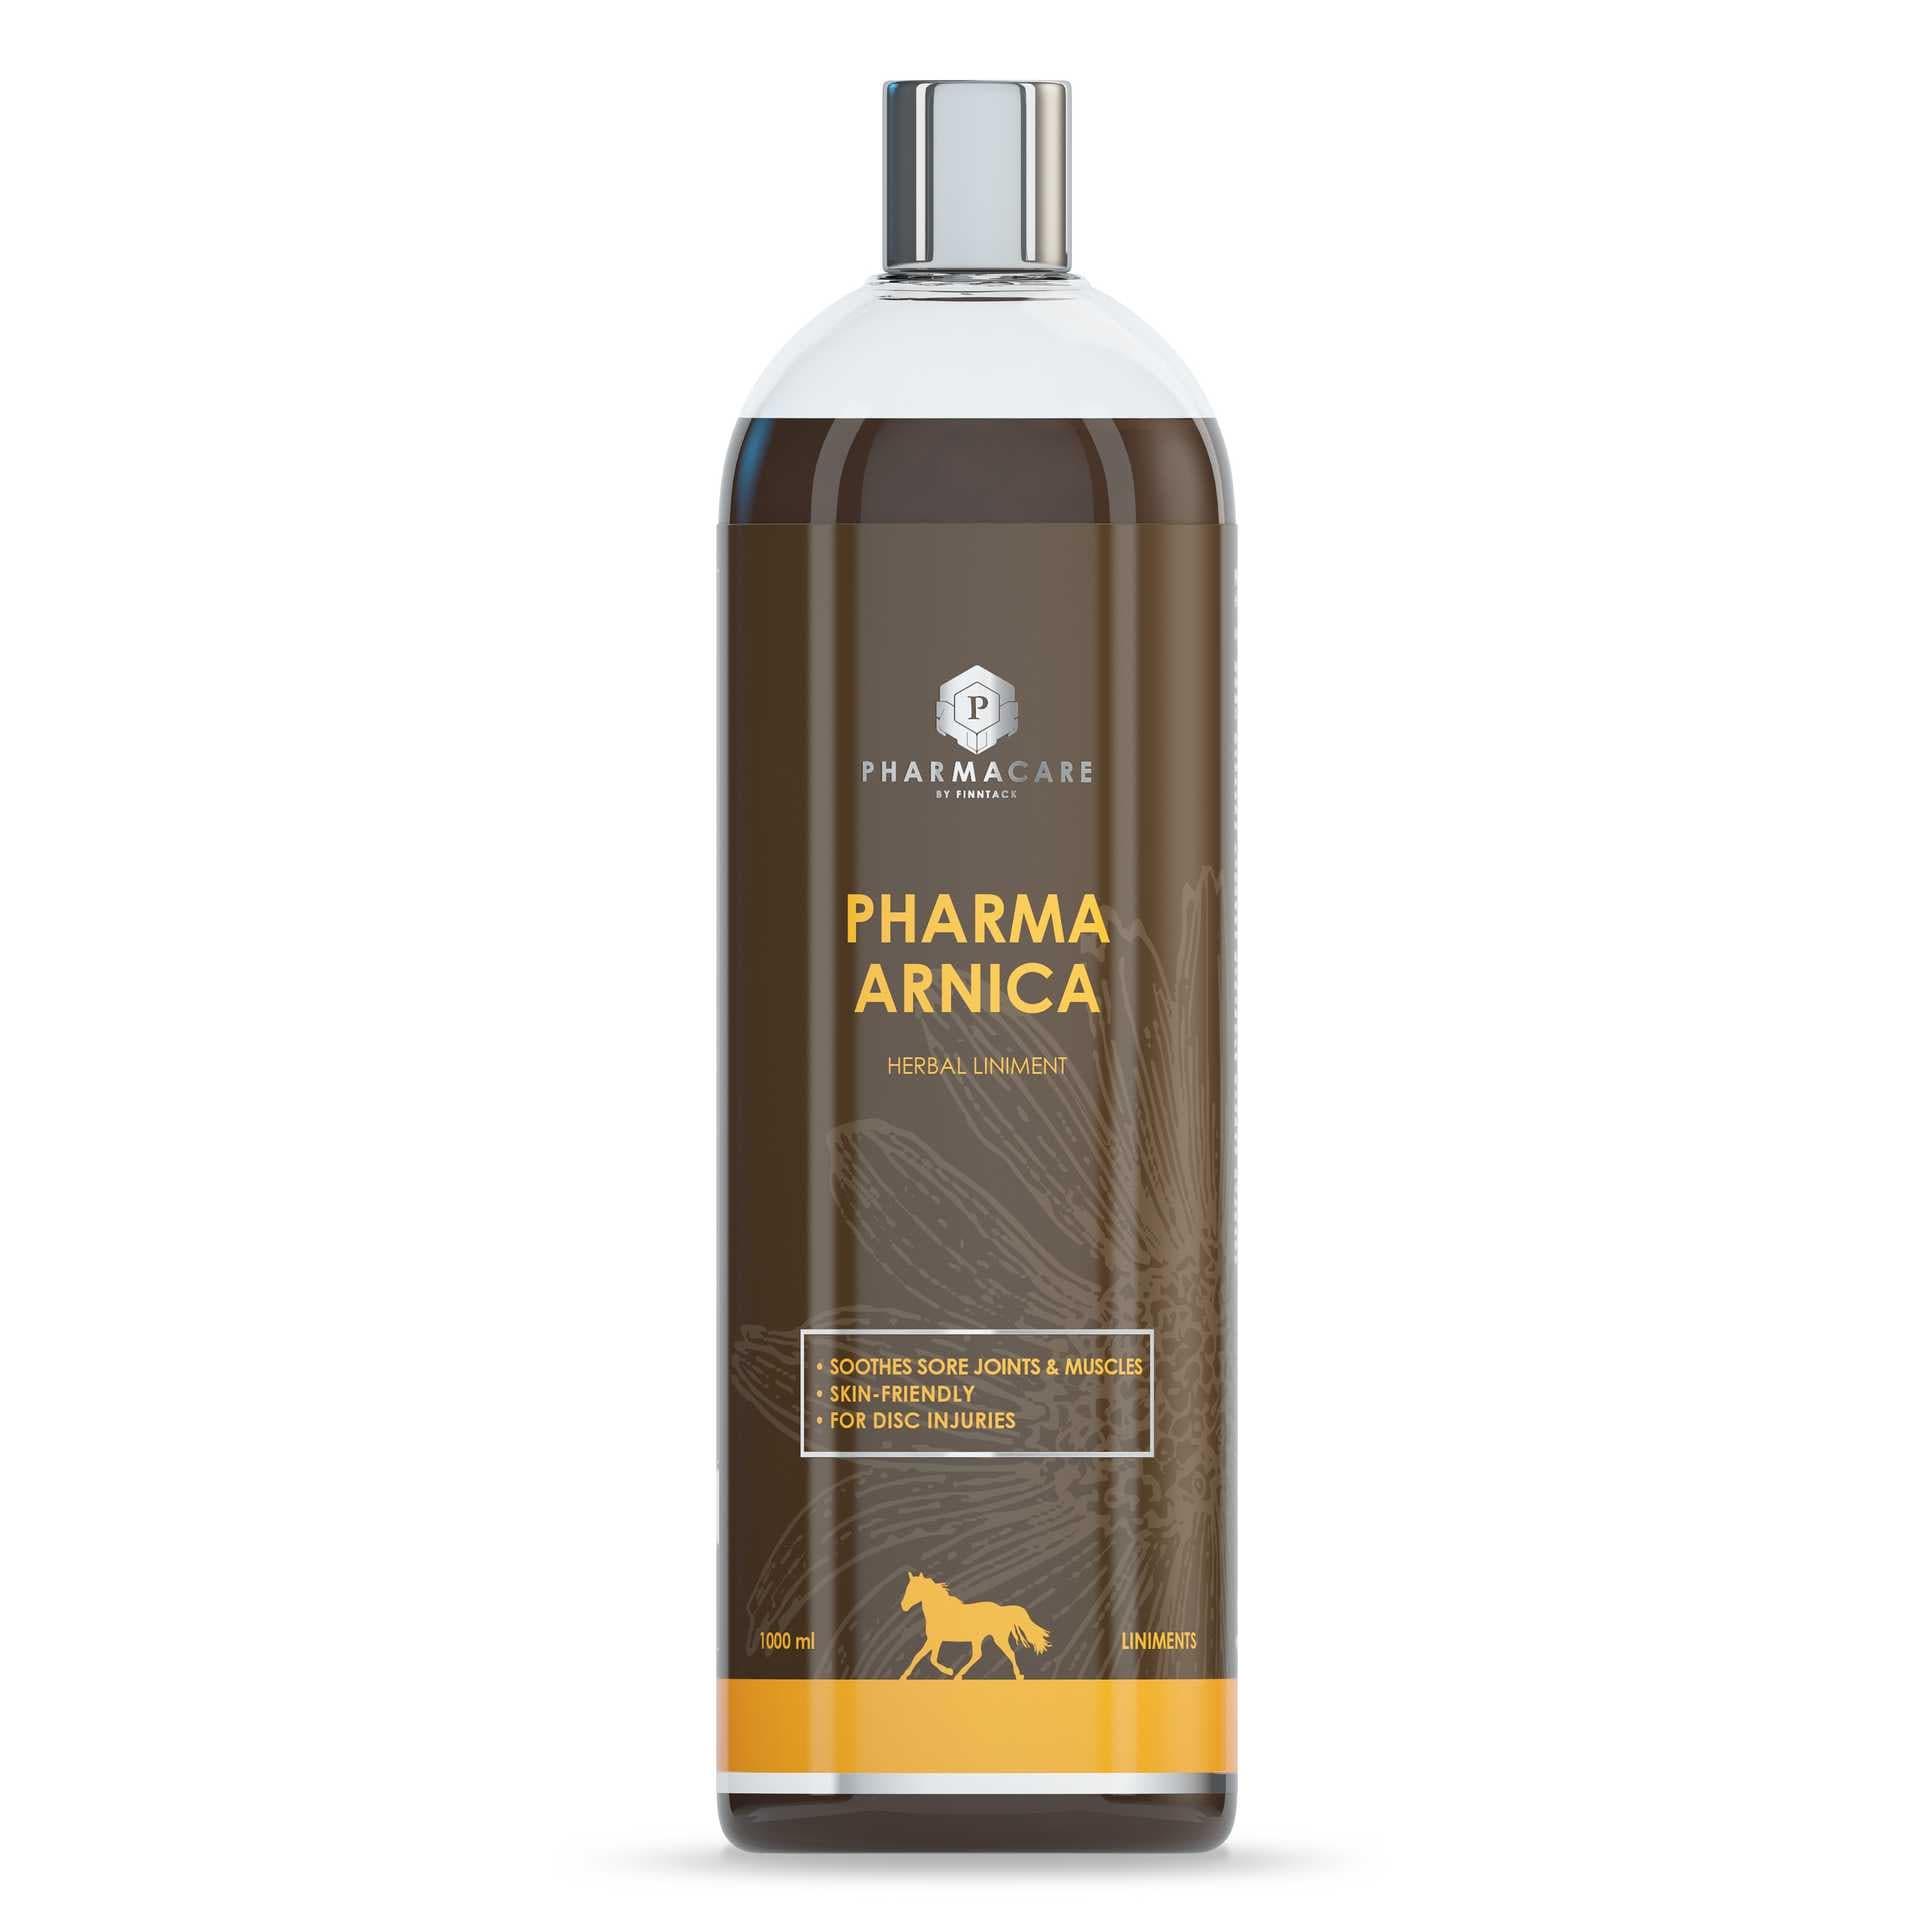 Pharma Arnica, 1000 ml